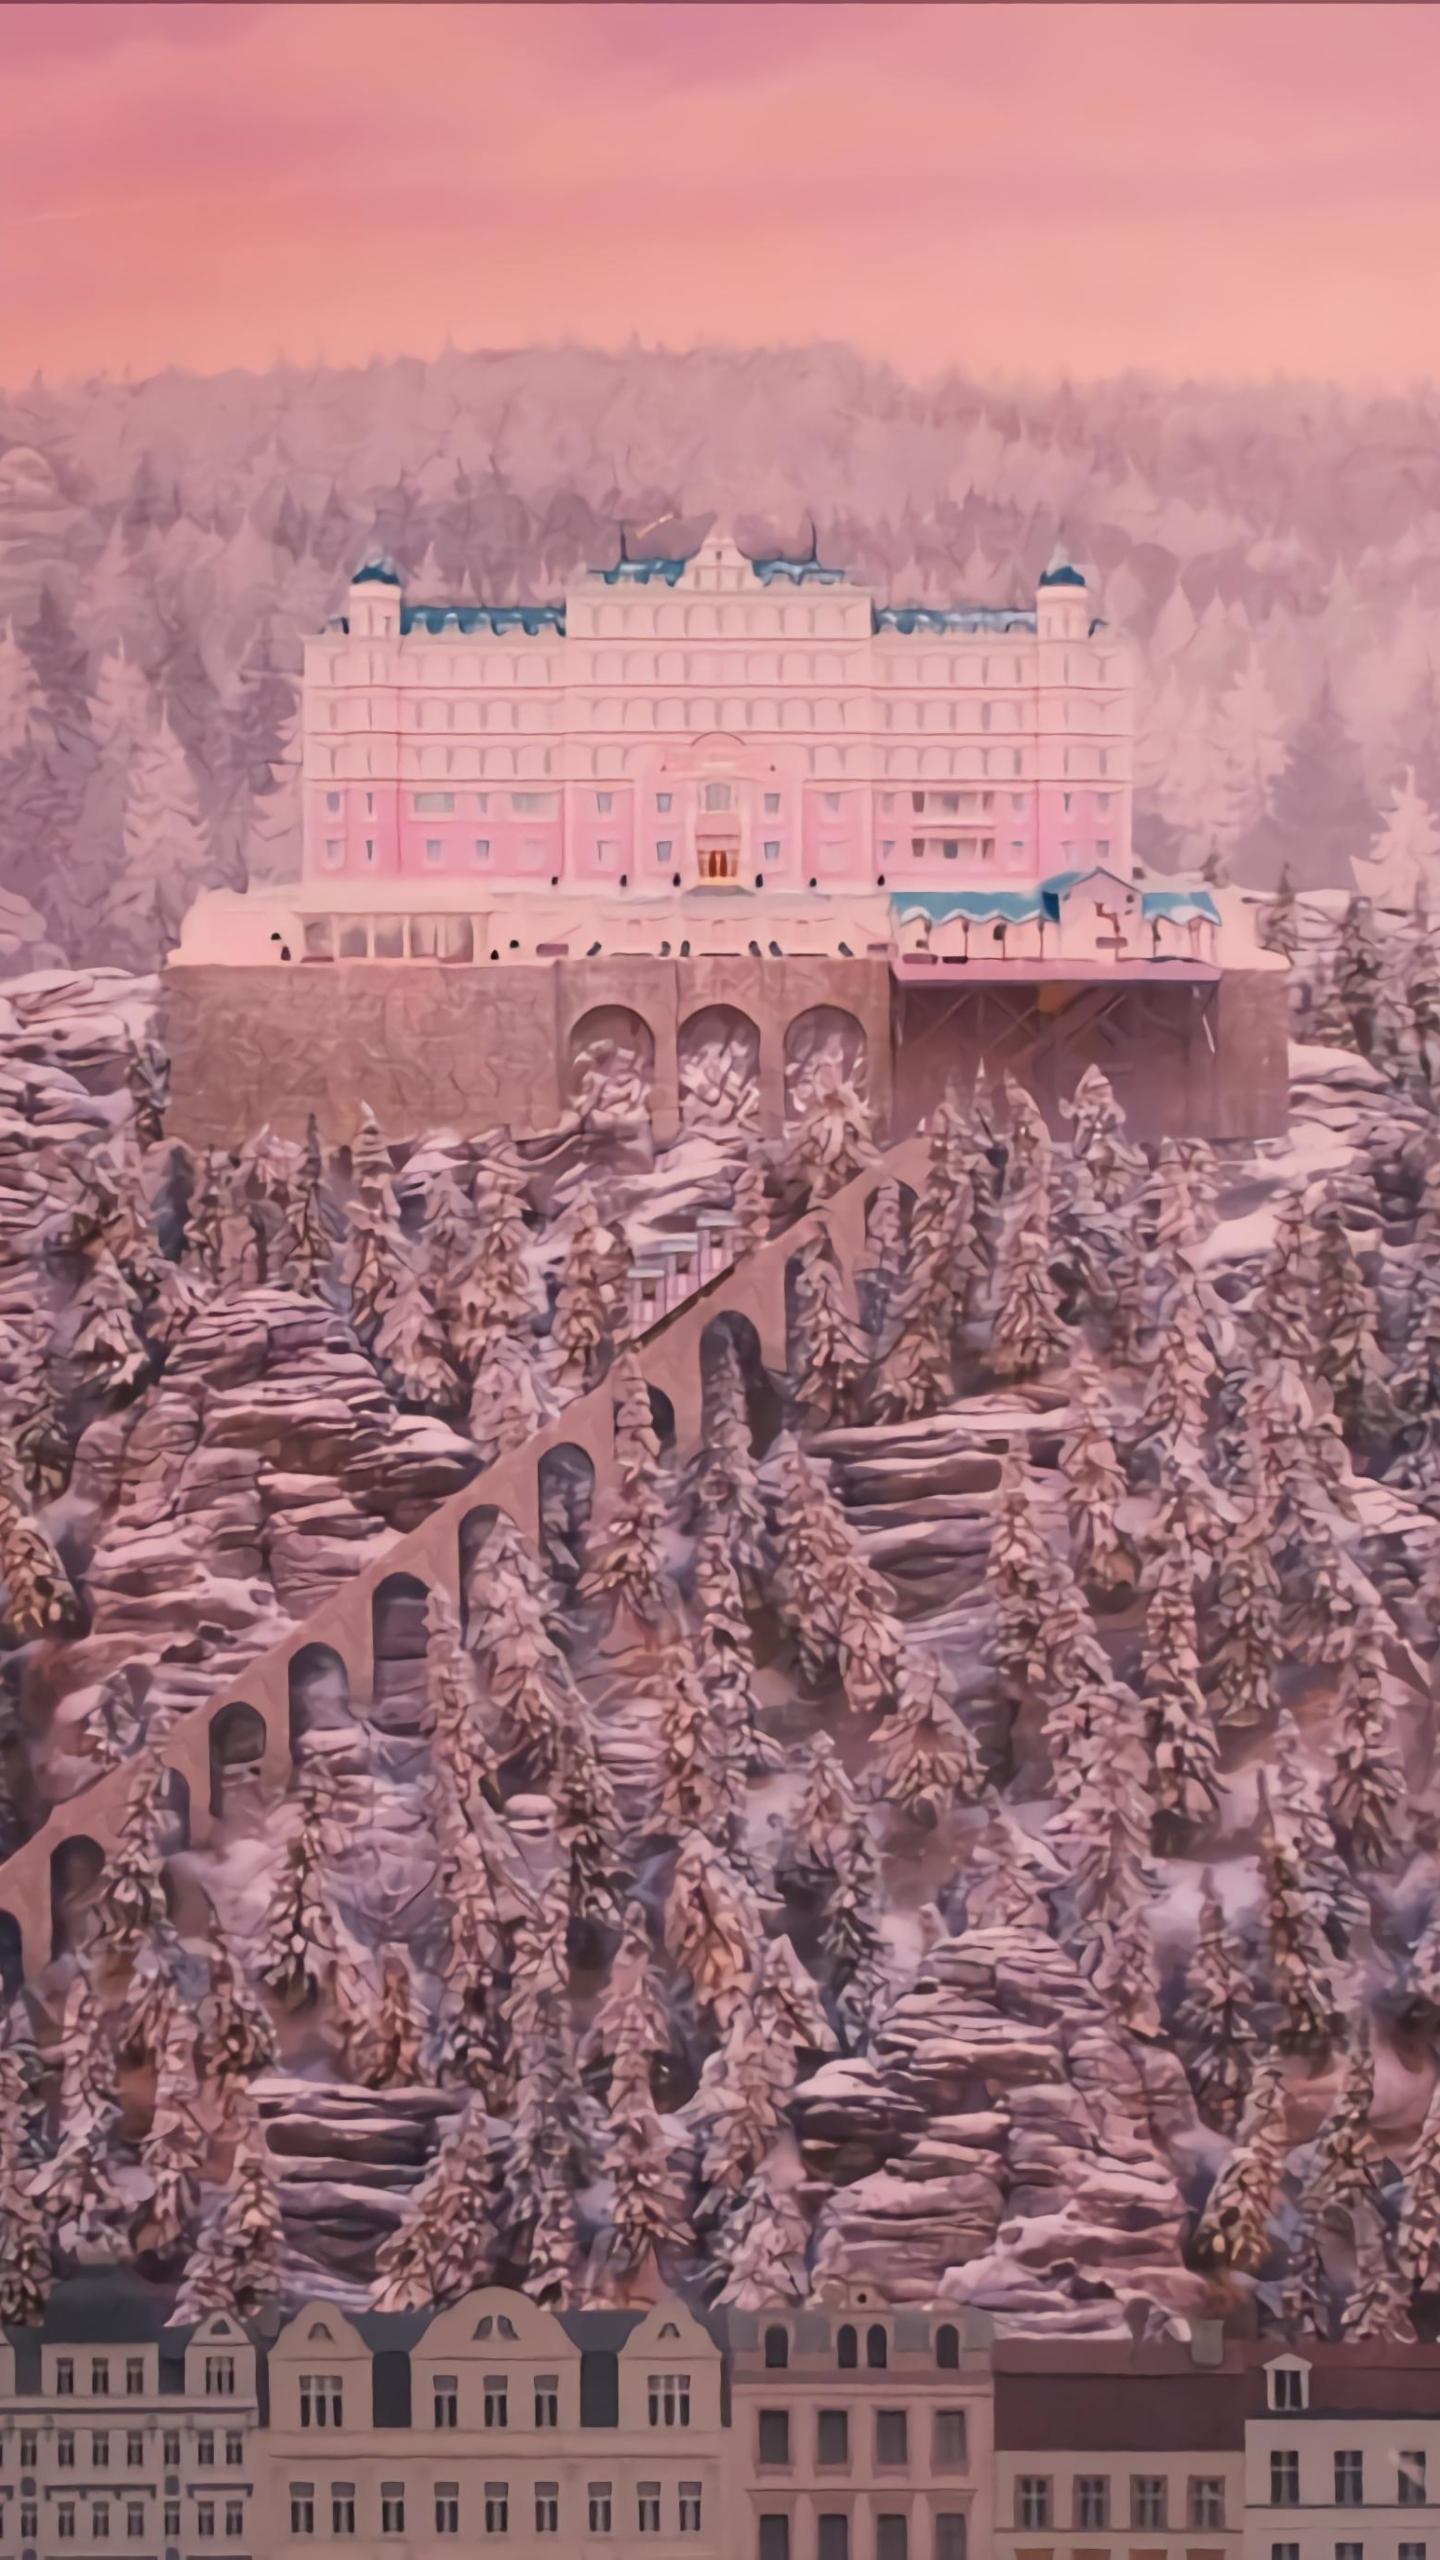 MovieThe Grand Budapest Hotel 1440x2560 Wallpaper ID 687862 1440x2560